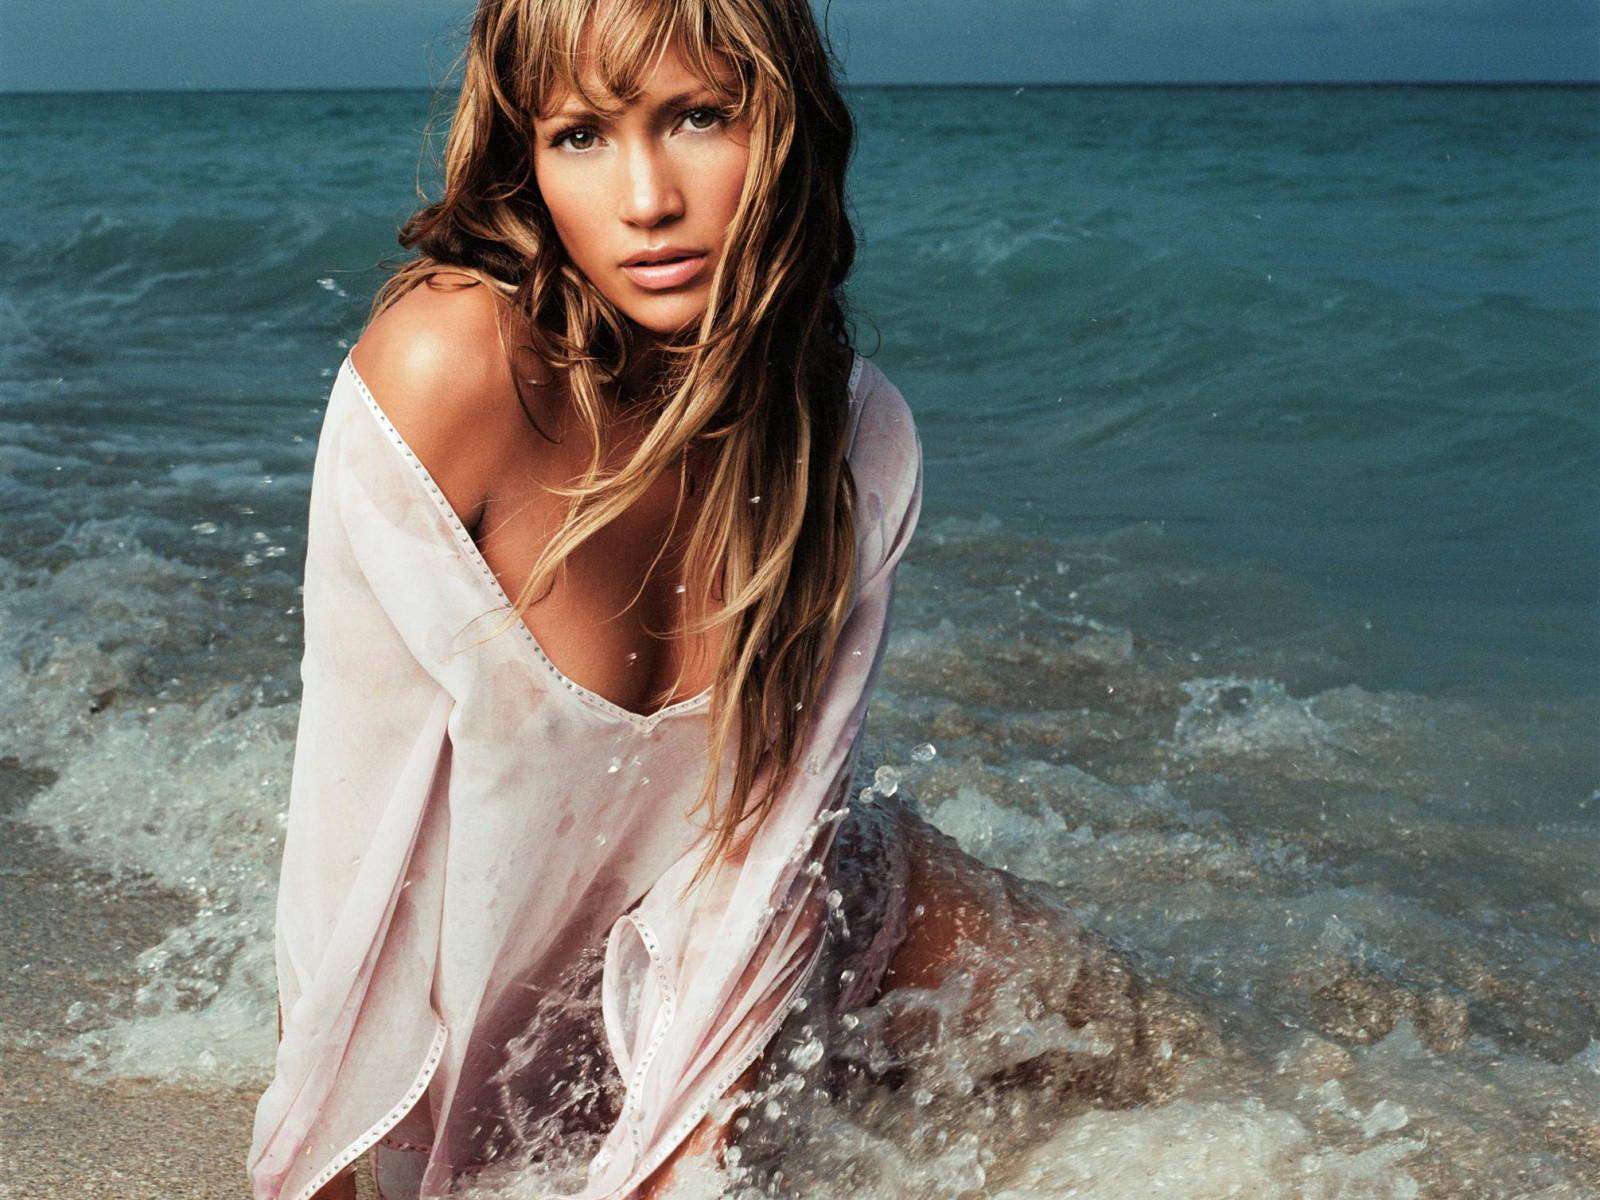 Jennifer Lopez Wallpapers High Quality